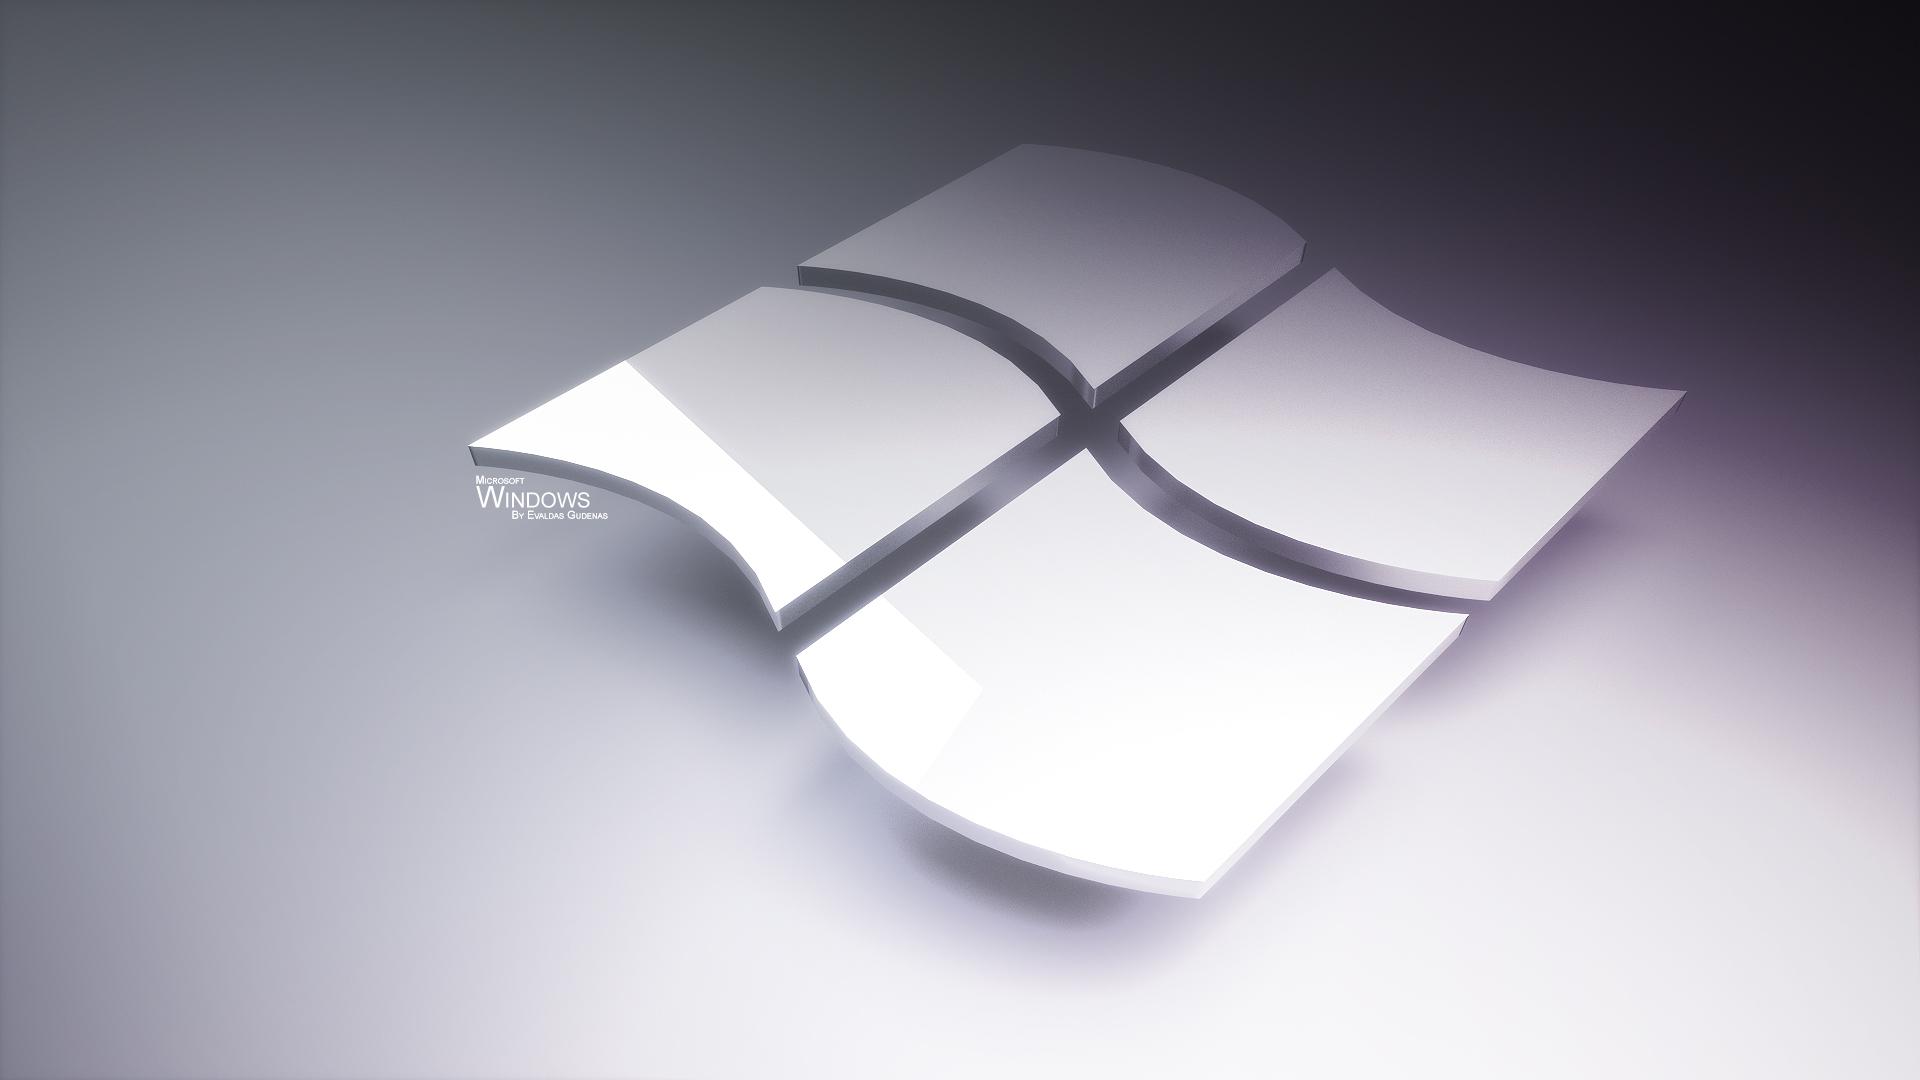 microsoft windows 81 hd wallpapers wallpapersafari